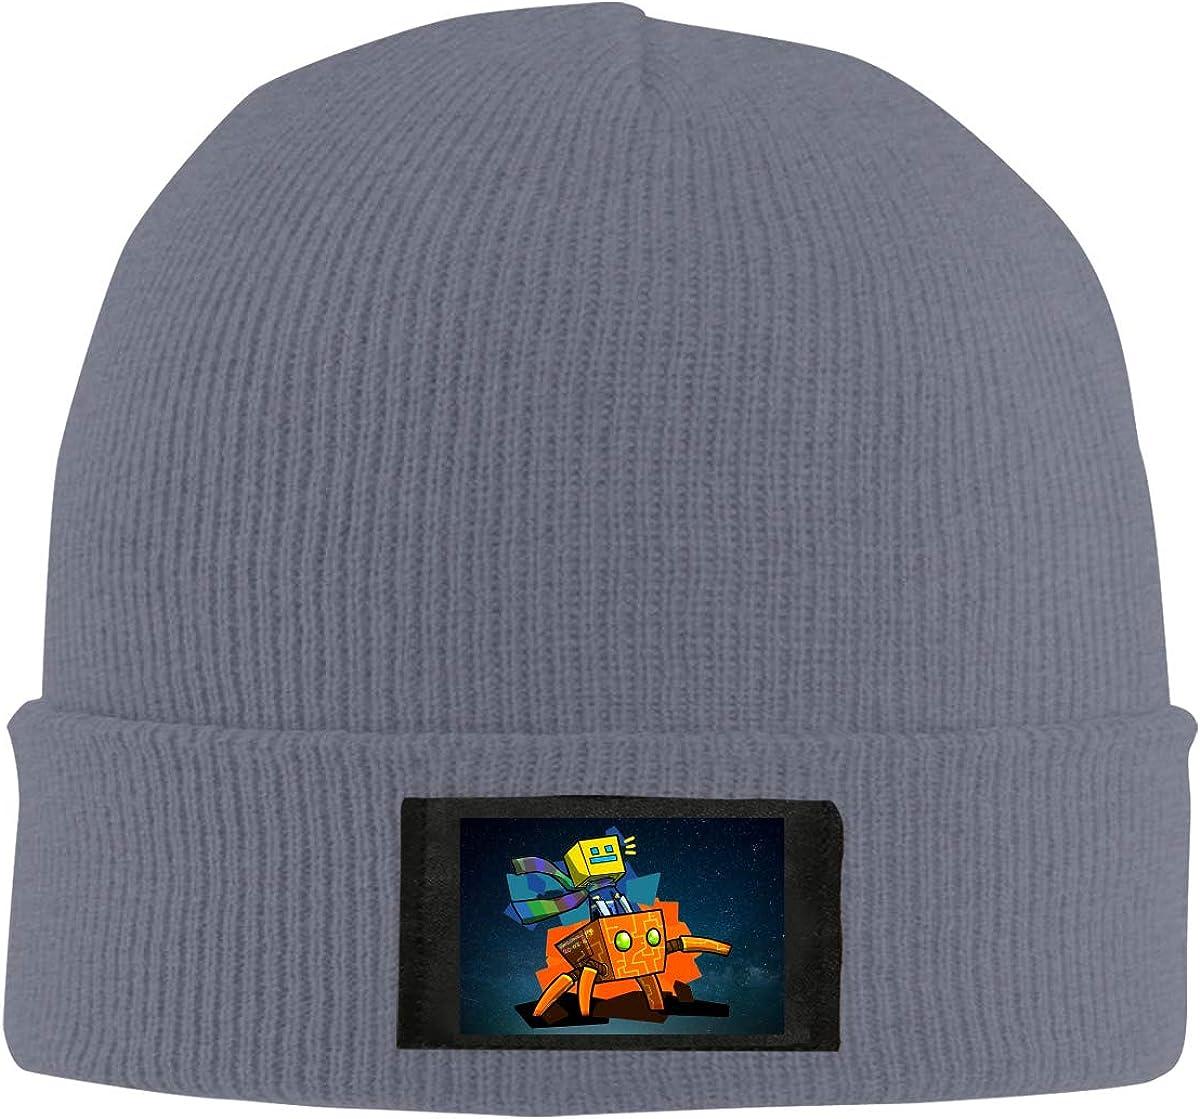 Ge-om-etry Gam Da-sh Unisex Knitted Cuffed Hats Winter Warm Stretch Beanie Solid Color Soft Black